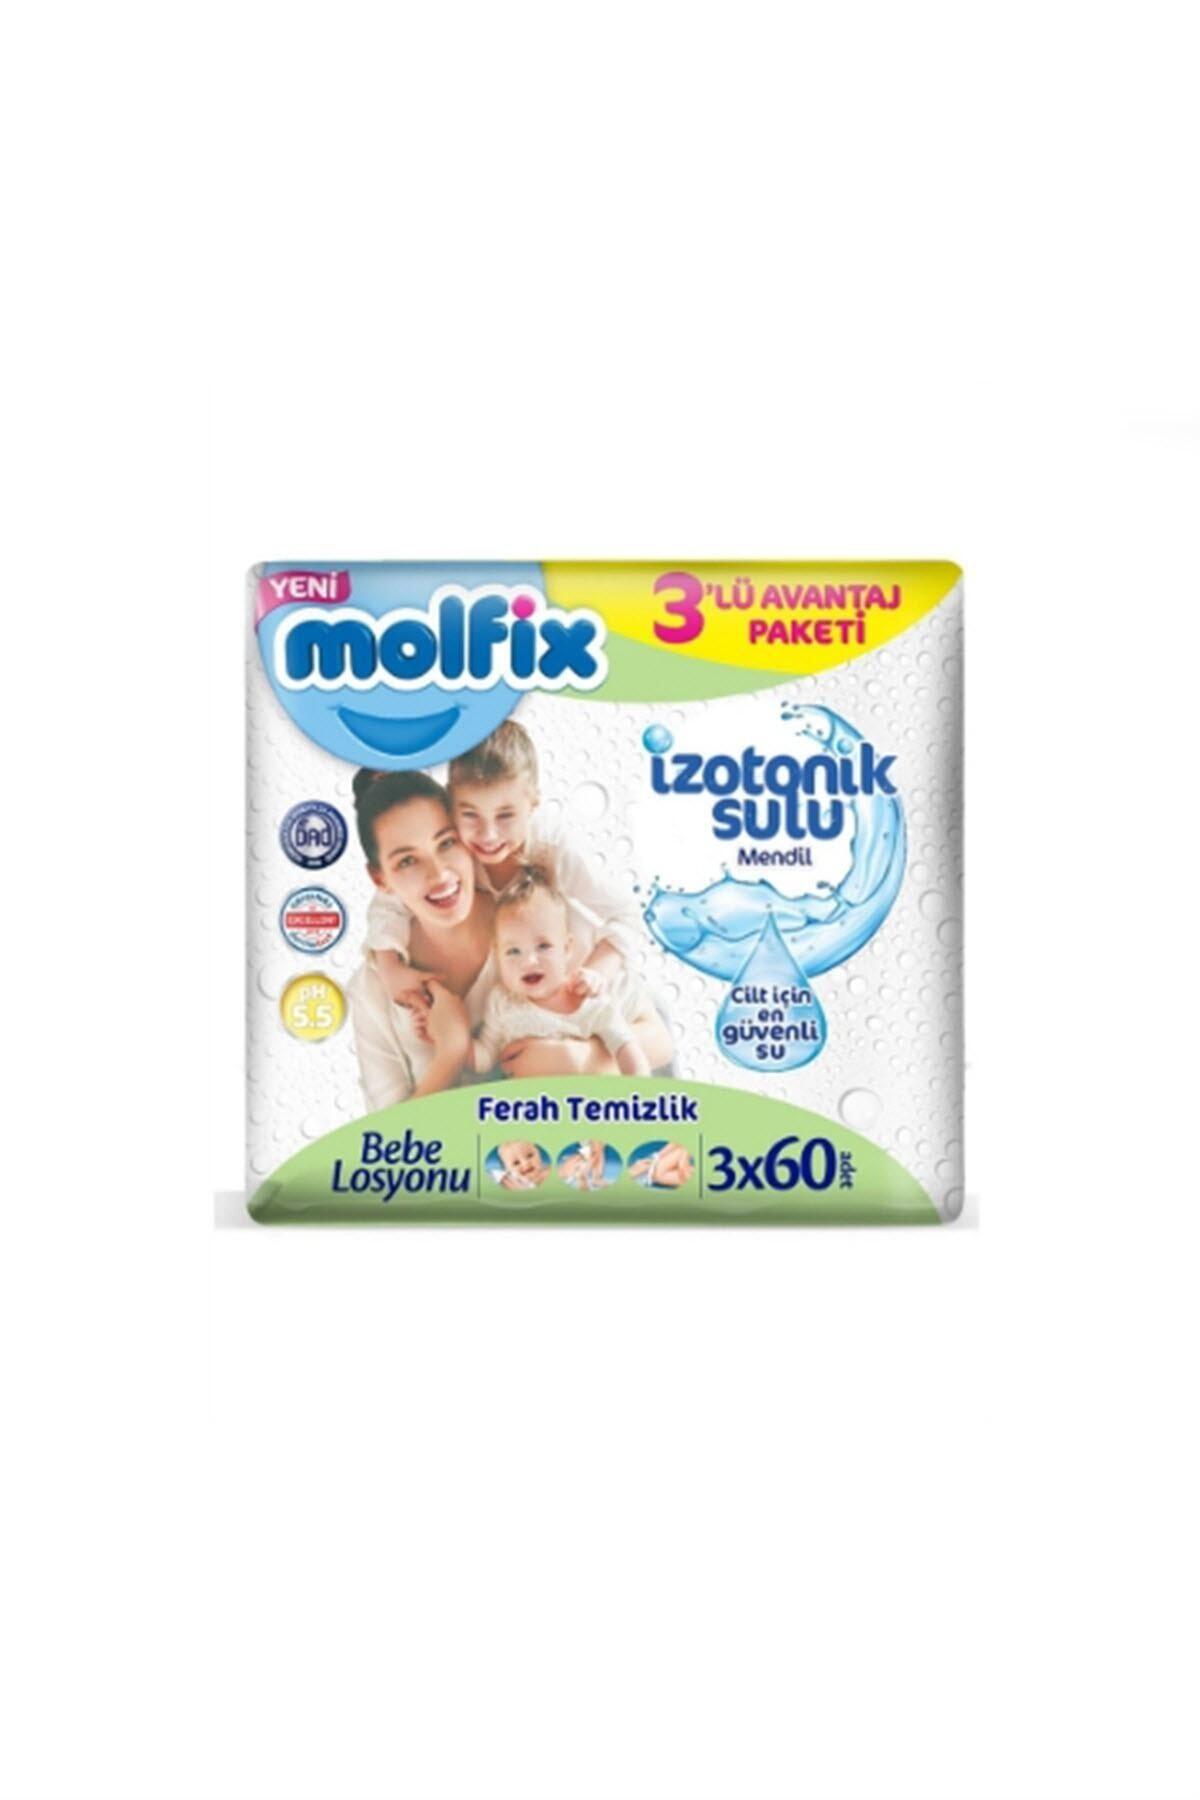 Molfix İzotonik Islak Havlu Ferah Temizlik 3'lü Paket 180 Yaprak 1